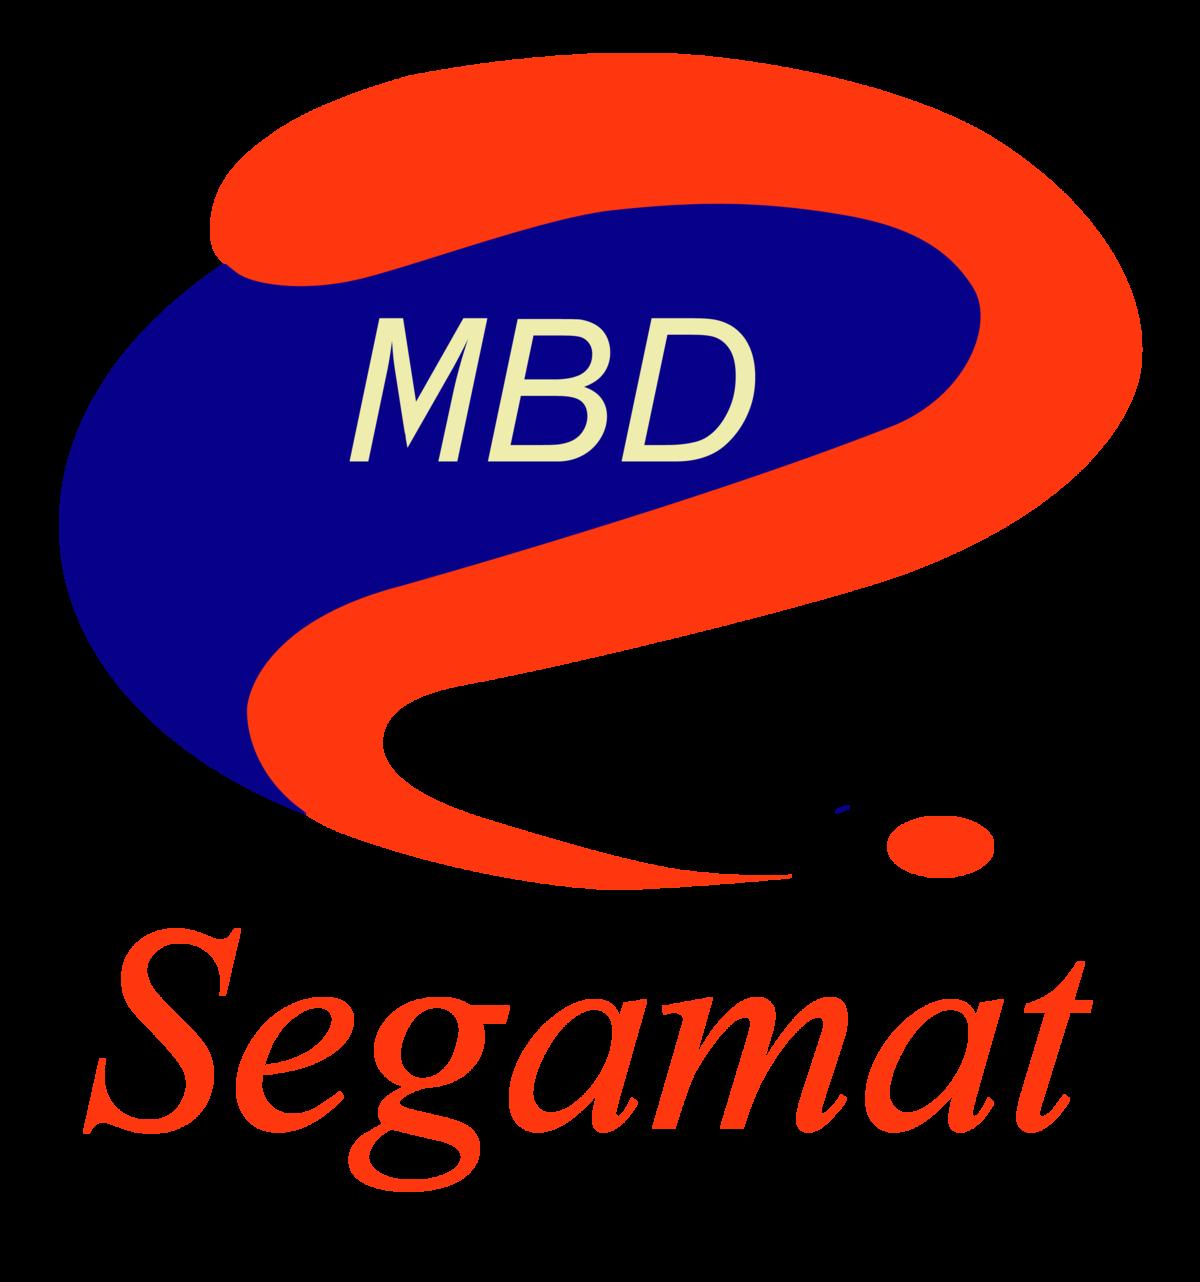 Majlis Belia Daerah Segamat Wikipedia Bahasa Melayu Ensiklopedia Bebas